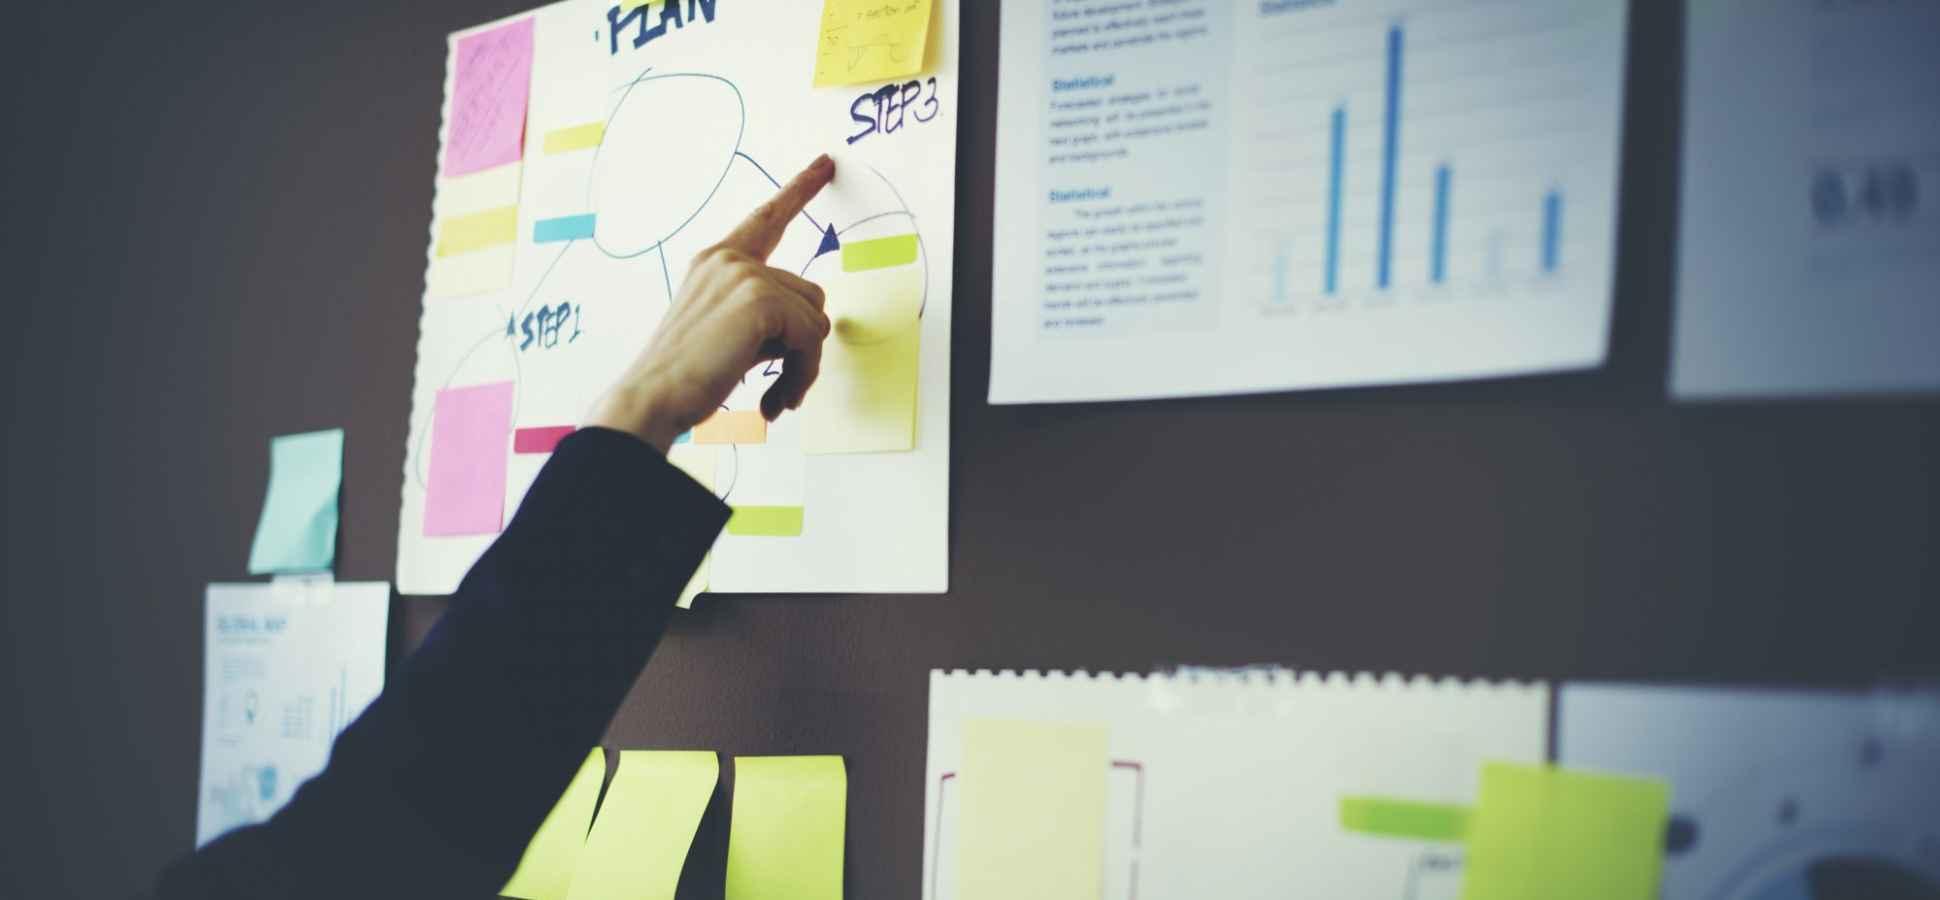 Influencer Marketing Programs: 3 Mistakes Brands Should Avoid